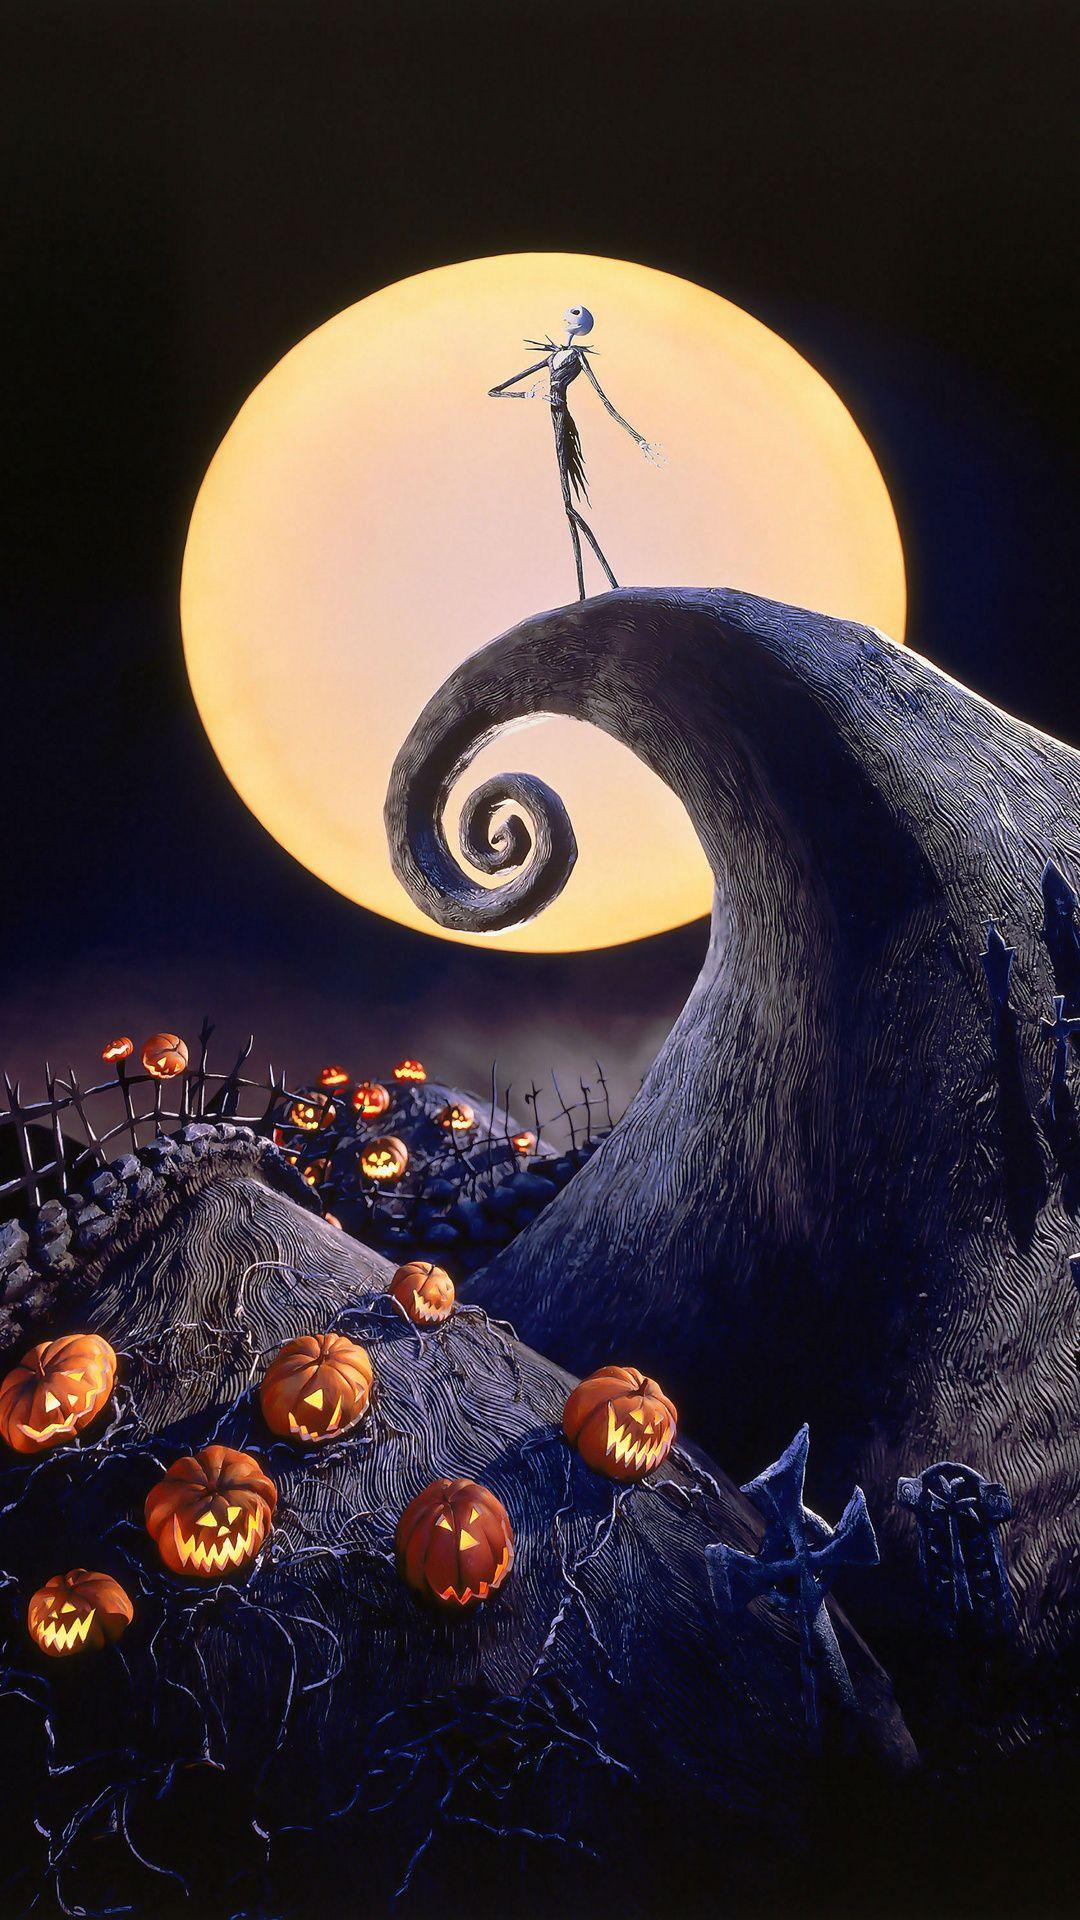 Pumpkin King Halloween Mobile Hd Wallpaper Nightmare Before Christmas Wallpaper Wallpaper Iphone Christmas Nightmare Before Christmas